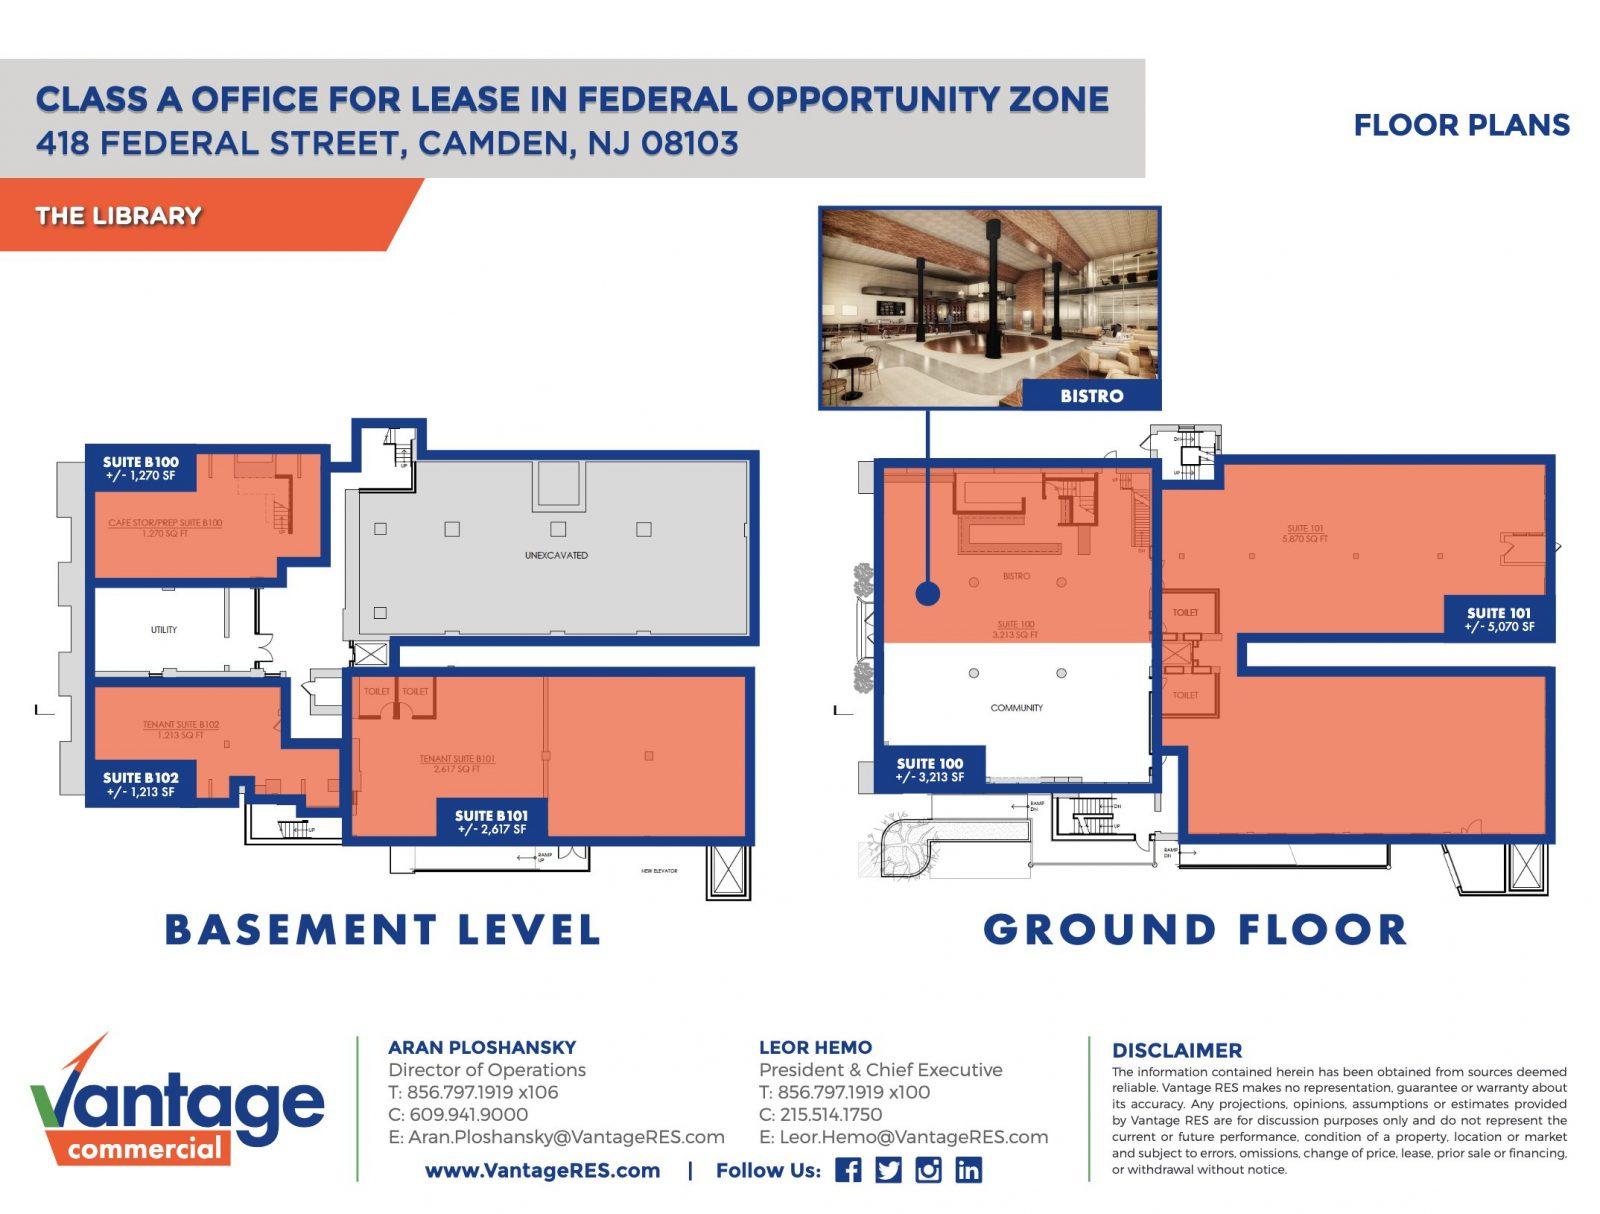 Basement Level & Ground Floor